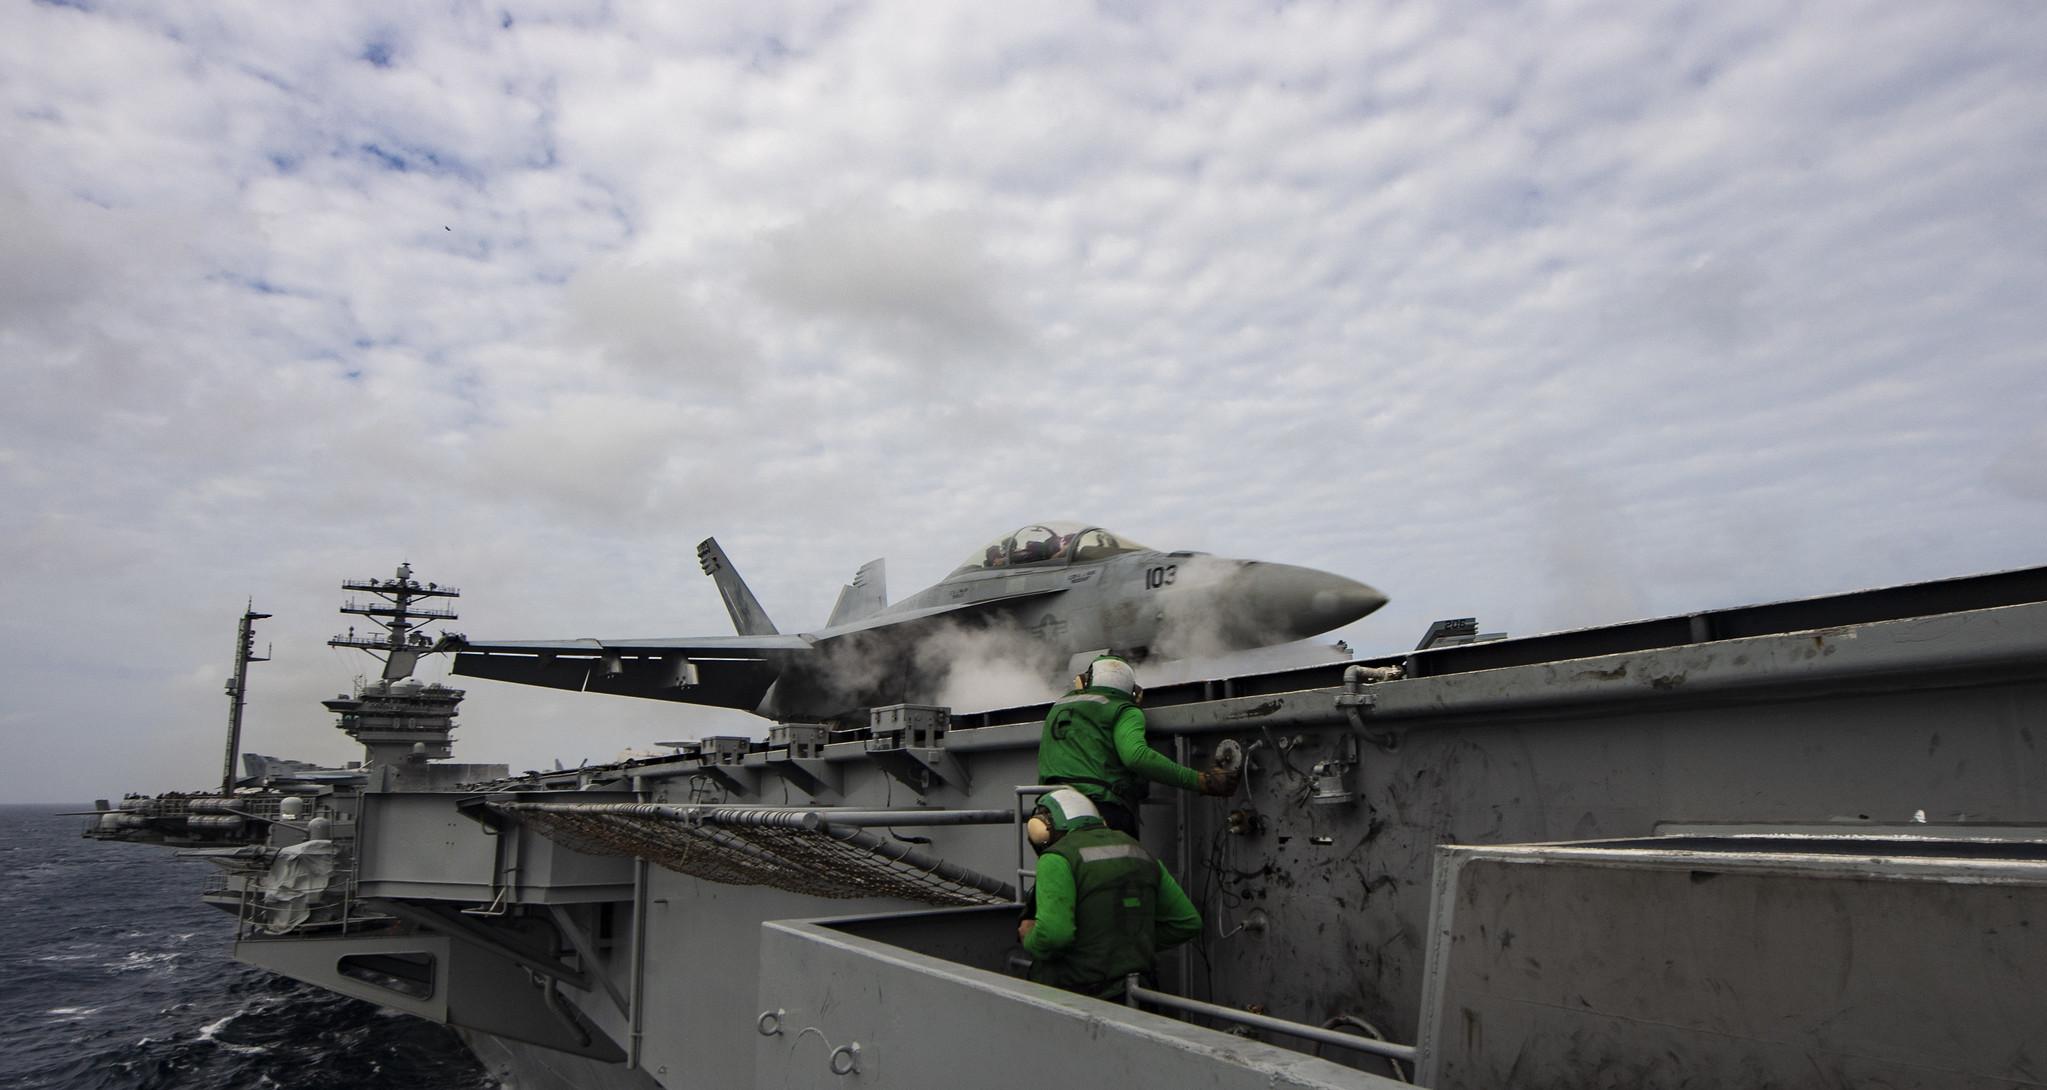 An F/A-18F Super Hornet launches off the flight deck of the aircraft carrier USS Nimitz (CVN 68) in the Arabian Sea on July 27, 2020. (MC3 Dalton Reidhead/Navy)